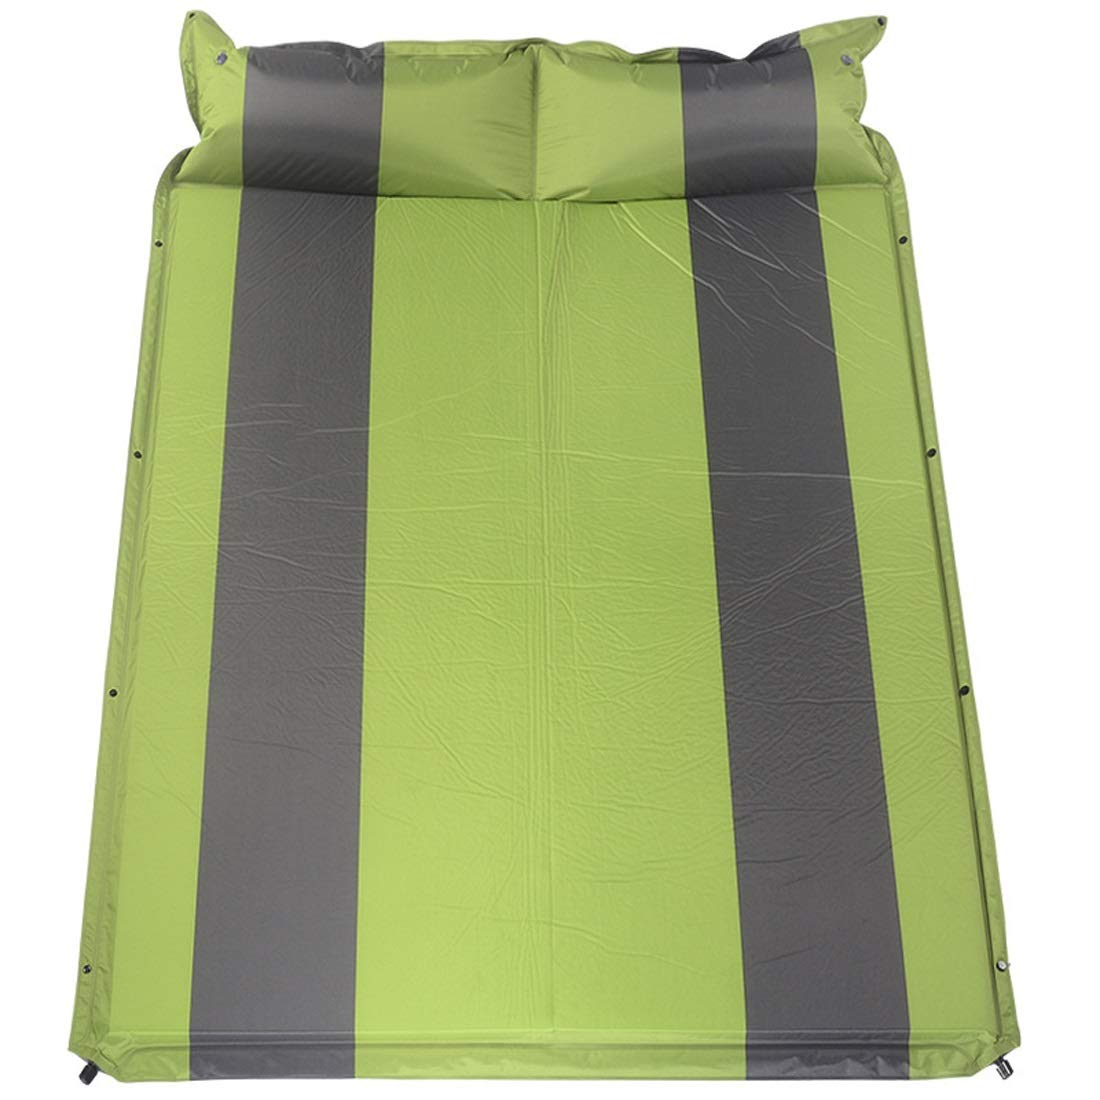 FELICIGG Aufblasbare Bett Twin Outdoor Aufblasbare Isomatte Camping Zelt Doppelbett Spleißbare Matratze